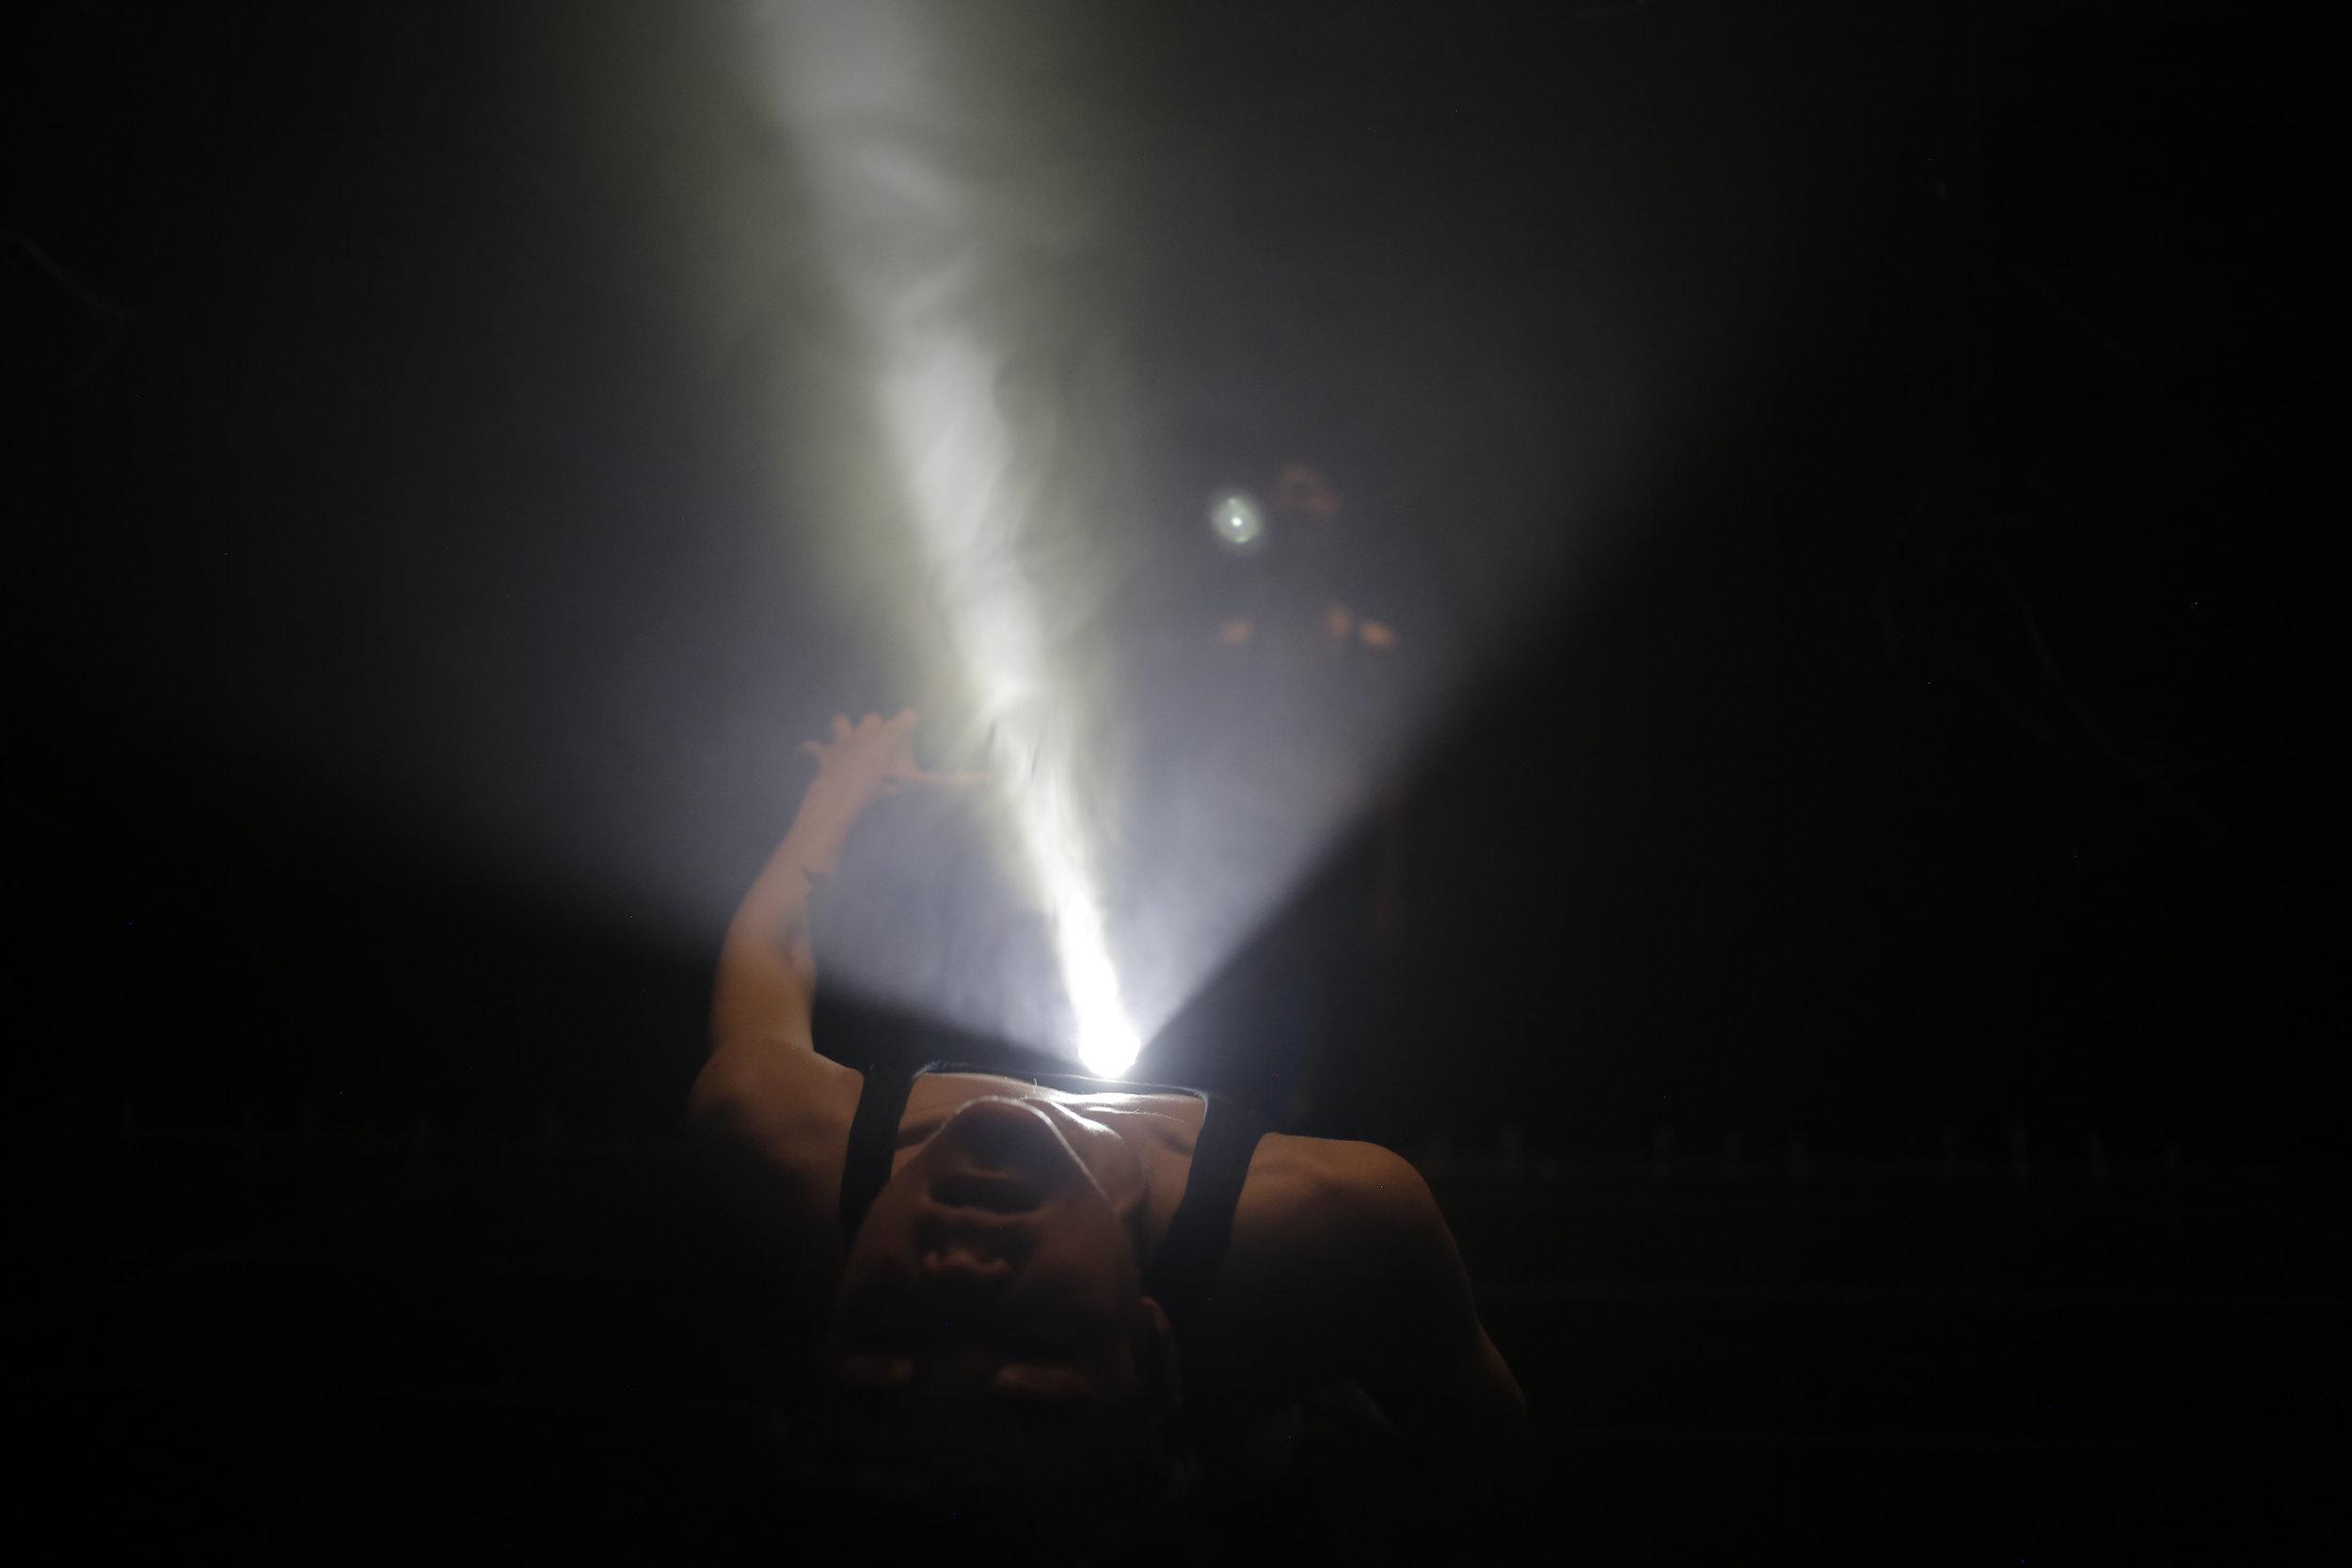 Brenna-leaning-back-with-flashlight.JPG